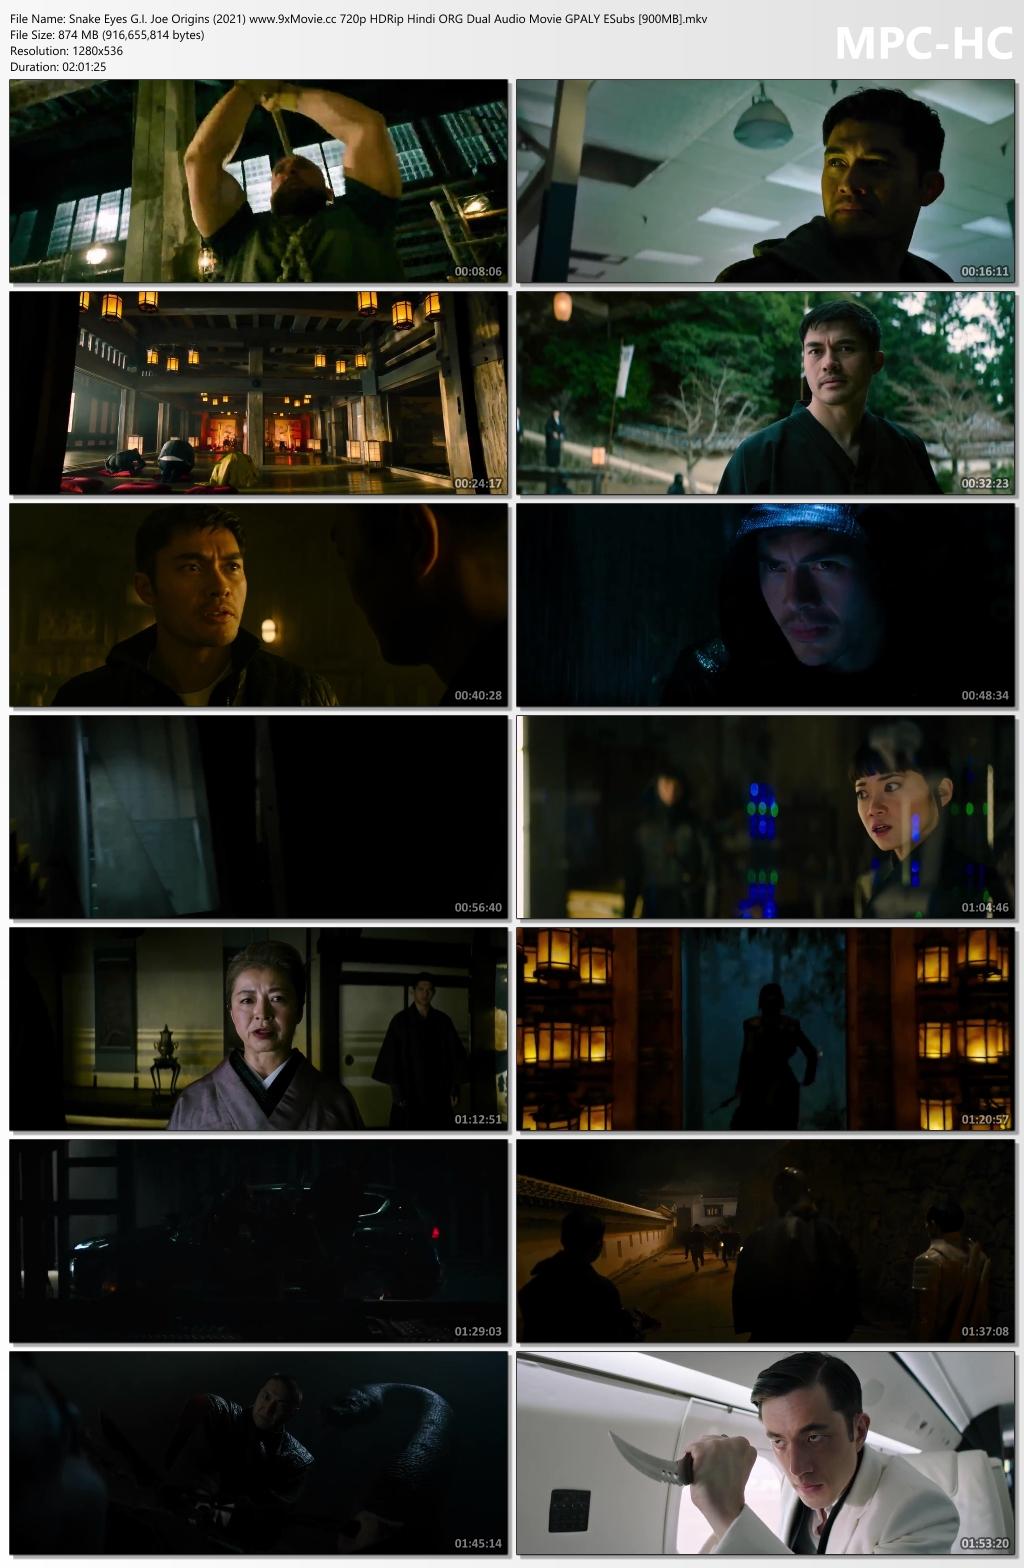 Snake-Eyes-G-I-Joe-Origins-2021-www-9x-Movie-cc-720p-HDRip-Hindi-ORG-Dual-Audio-Movie-GPALY-ESubs-90